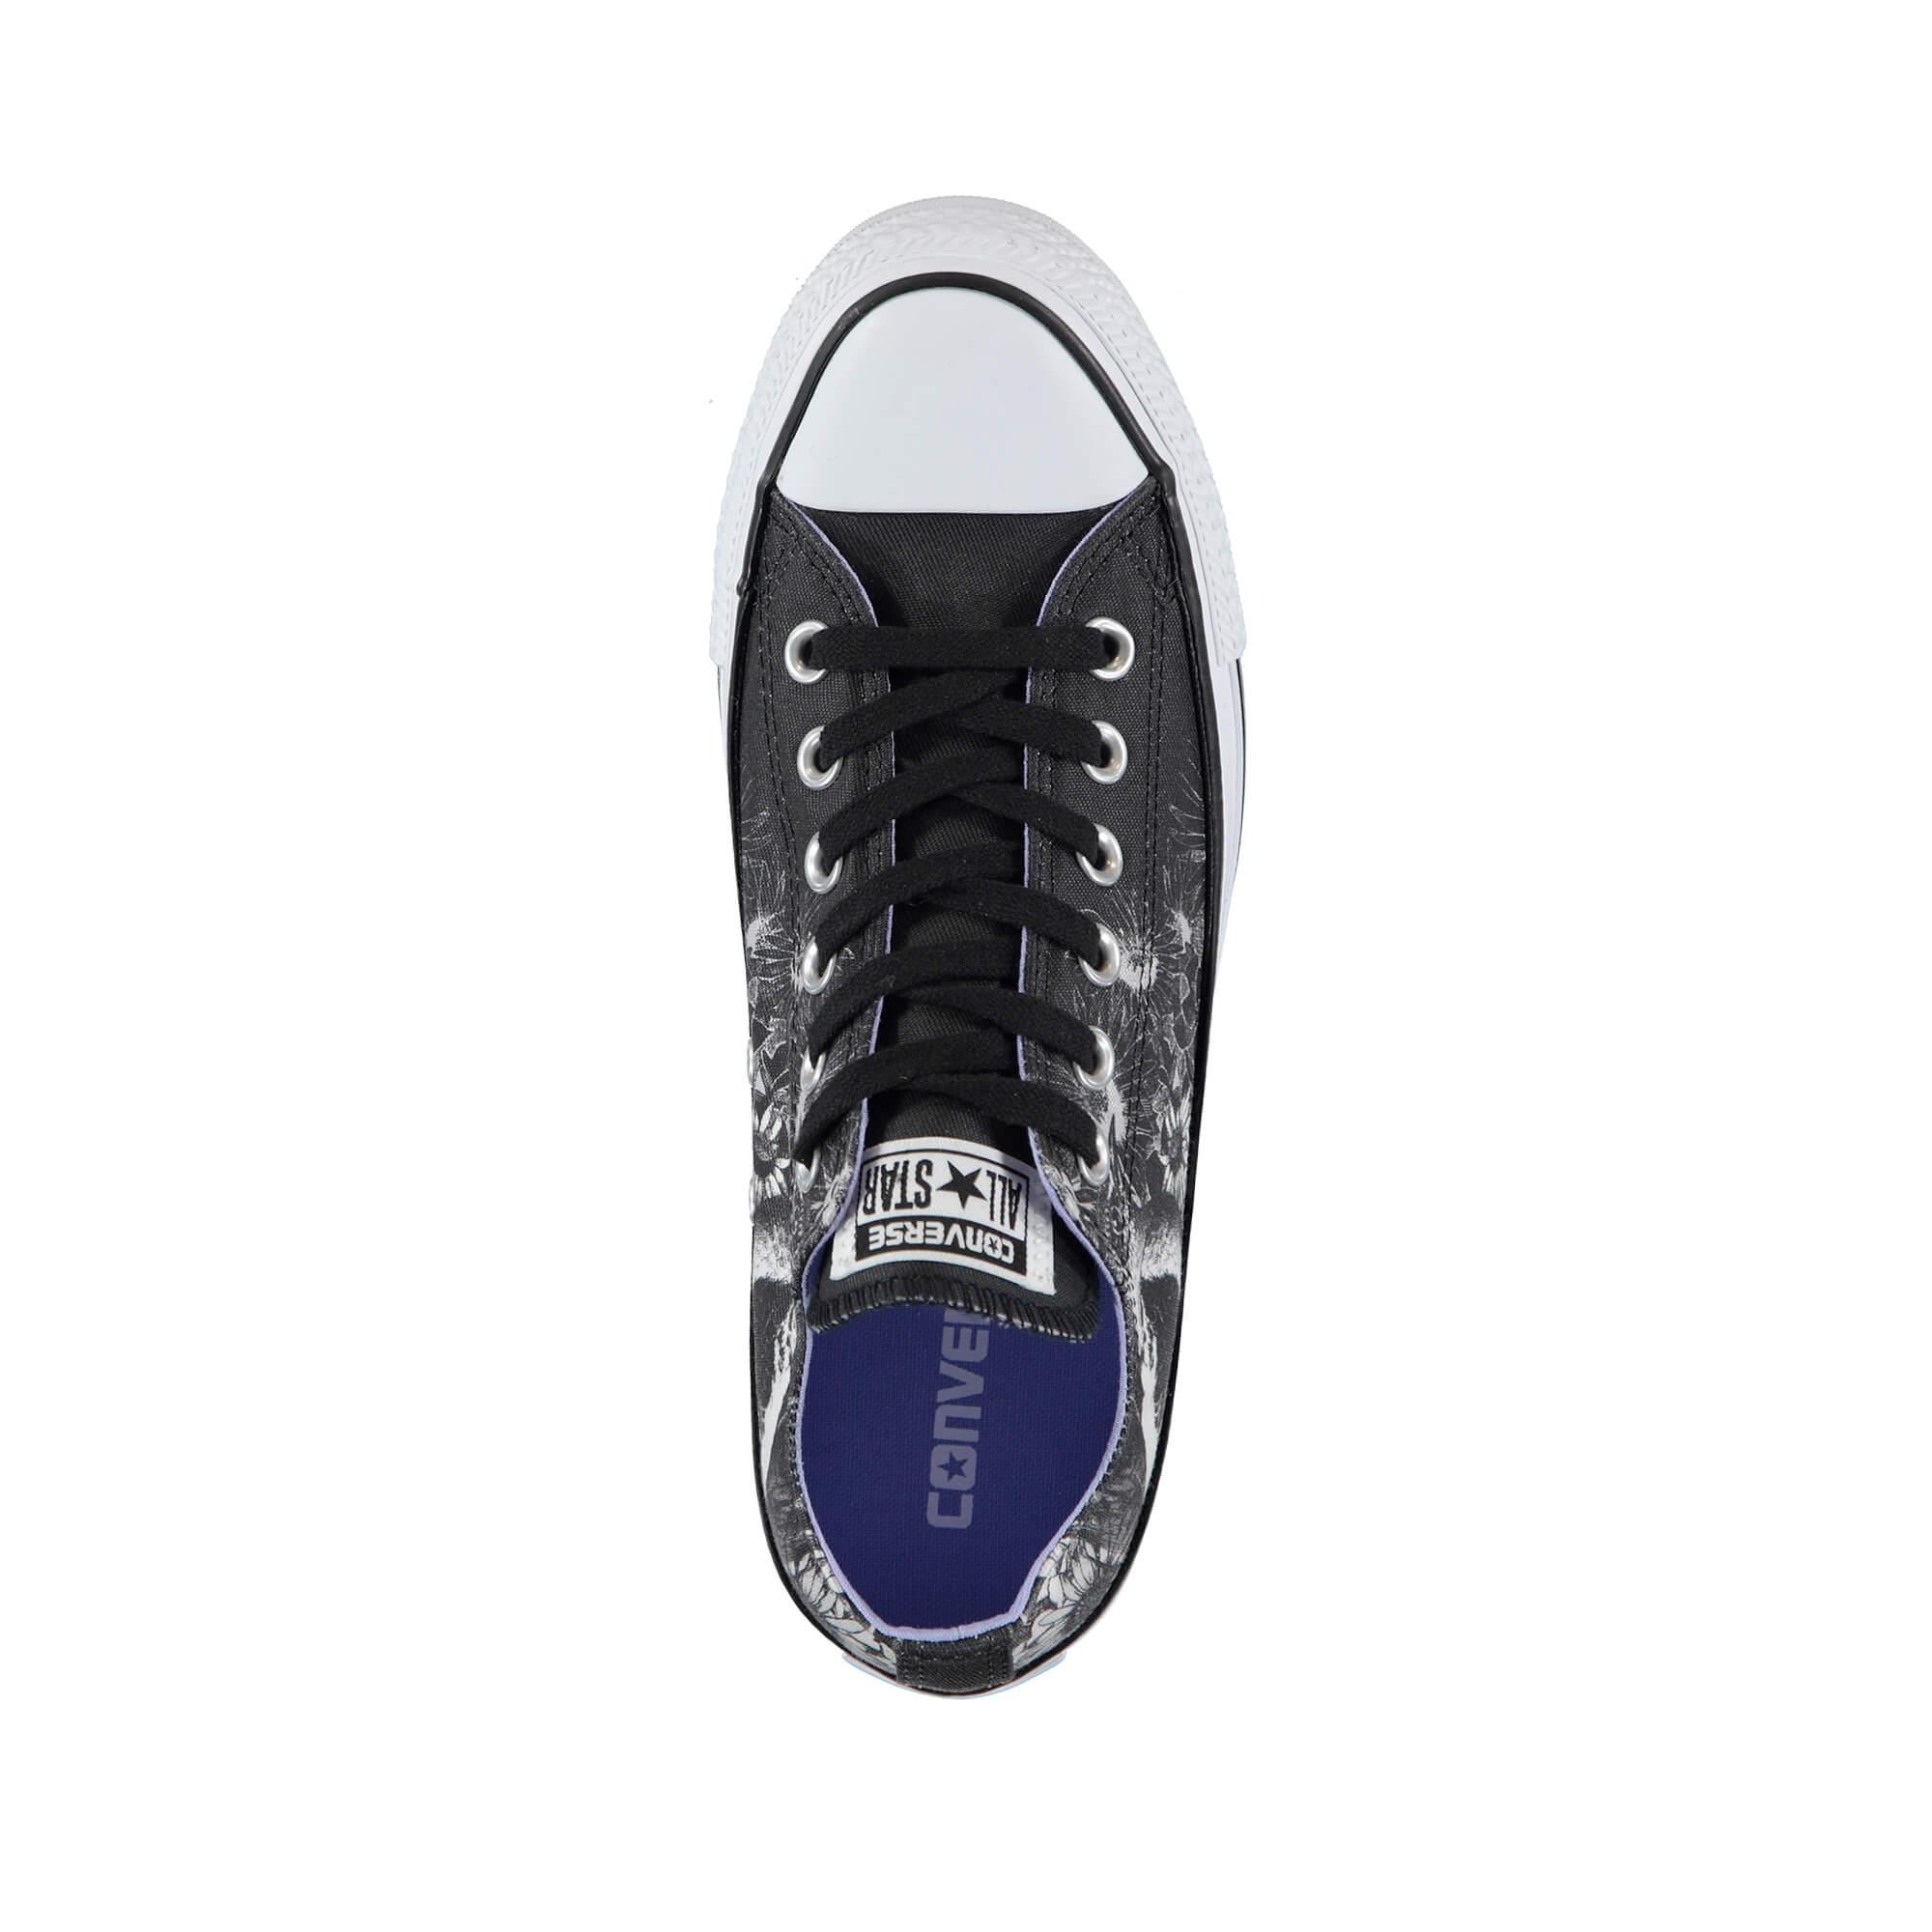 Converse Chuck Taylor All Star Kadın Siyah Desenli Sneaker